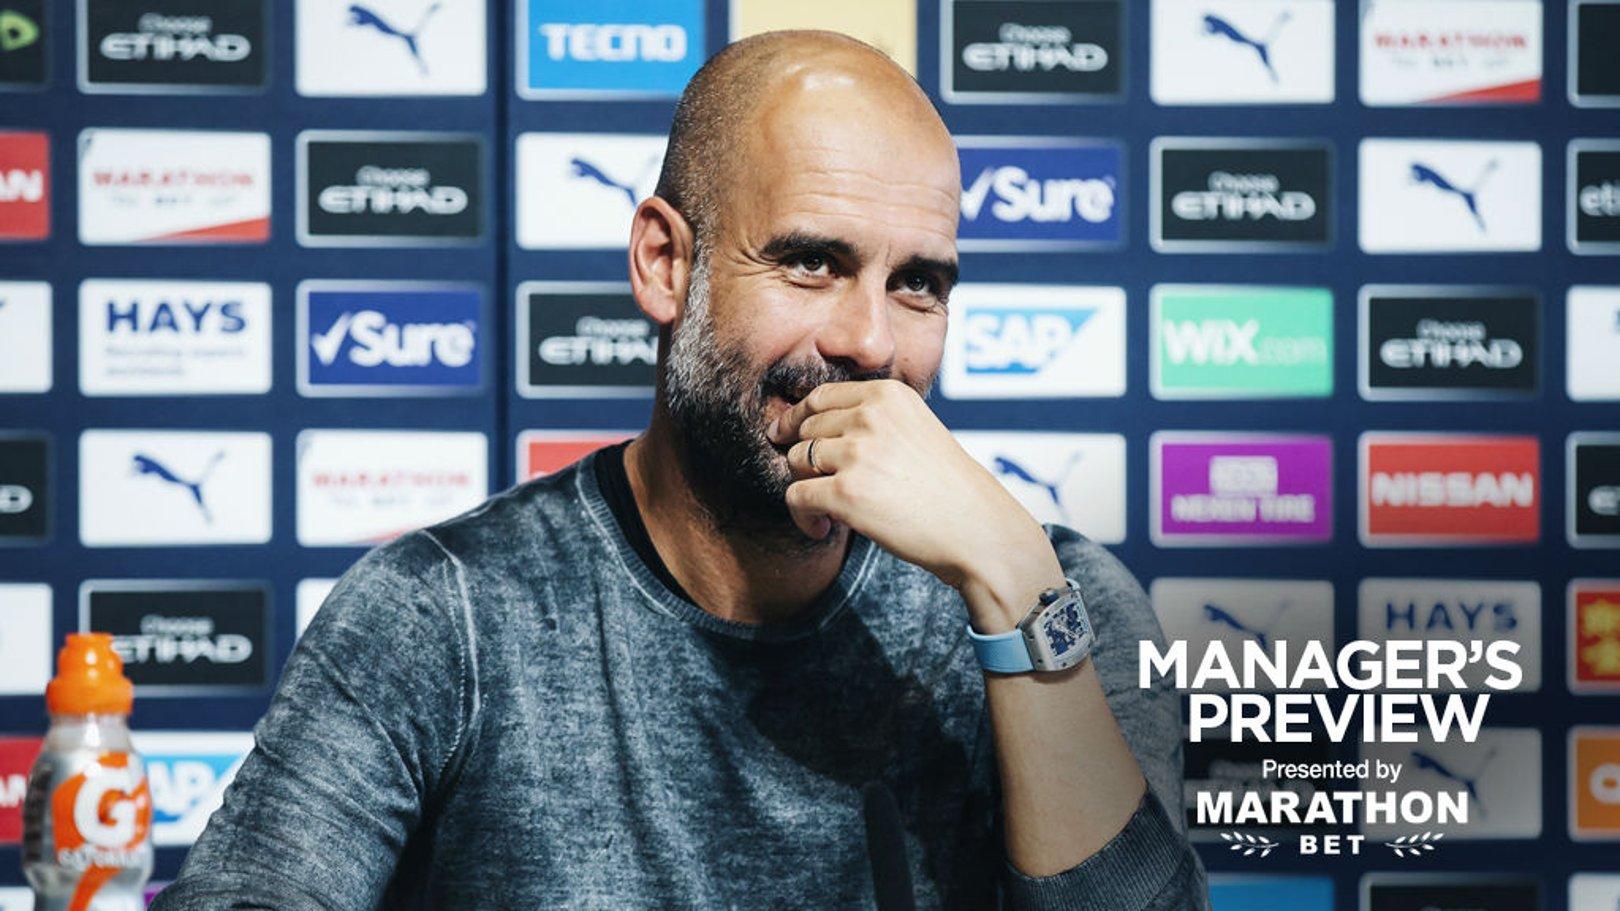 Guardiola's praise for 'game-changer' Mahrez